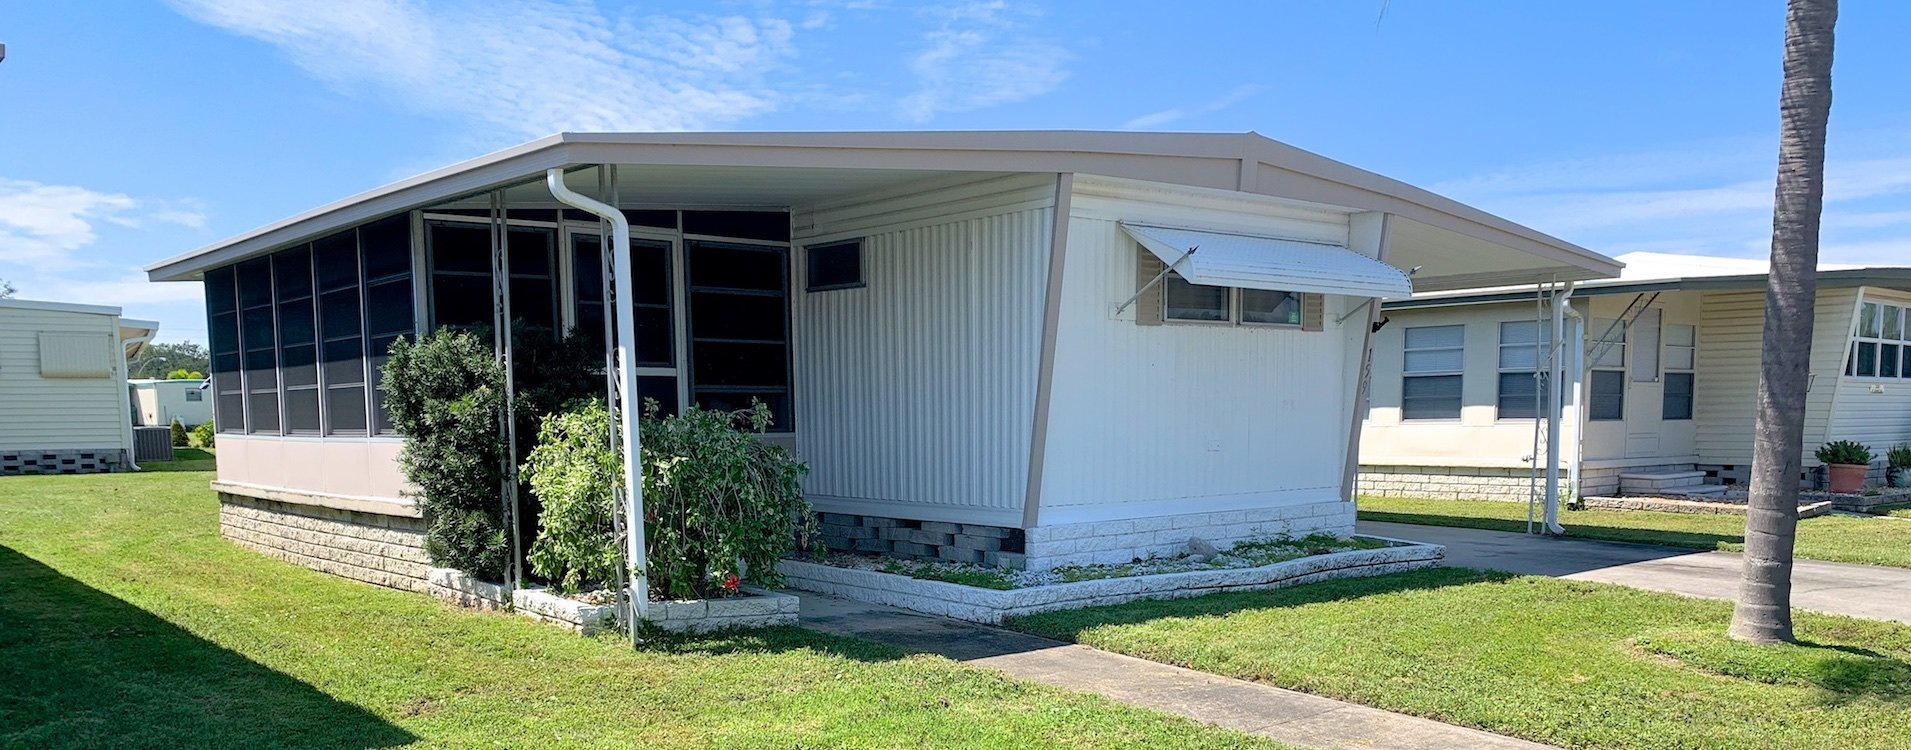 Mobile Home For Sale Largo Fl Four Seasons 159